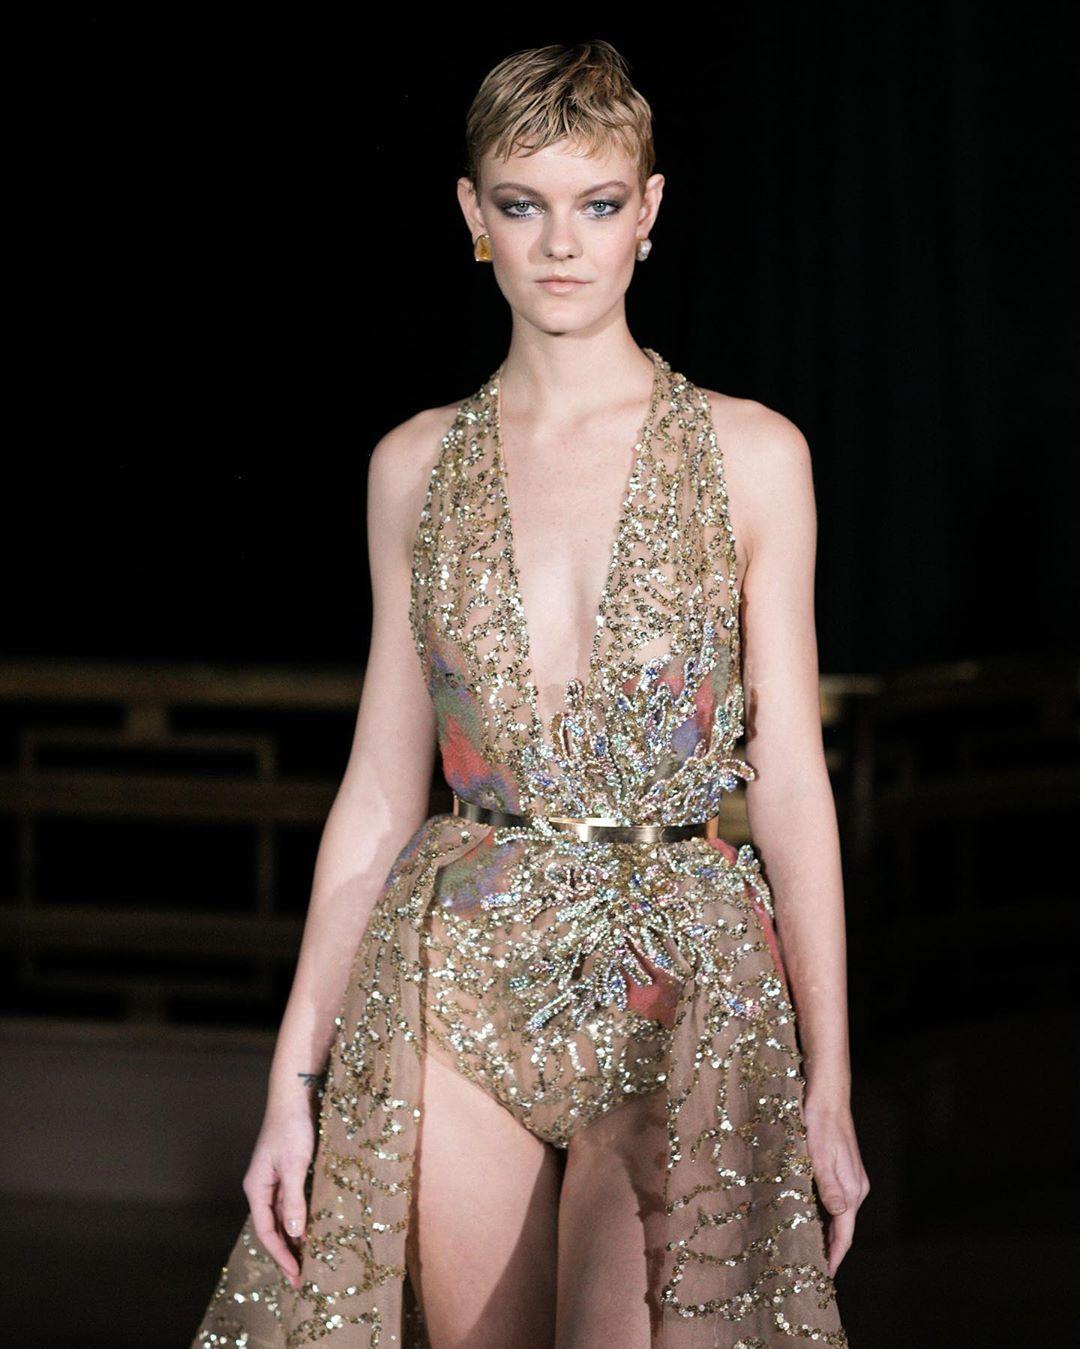 Women's Gold Sequin Leotard with Overskirt